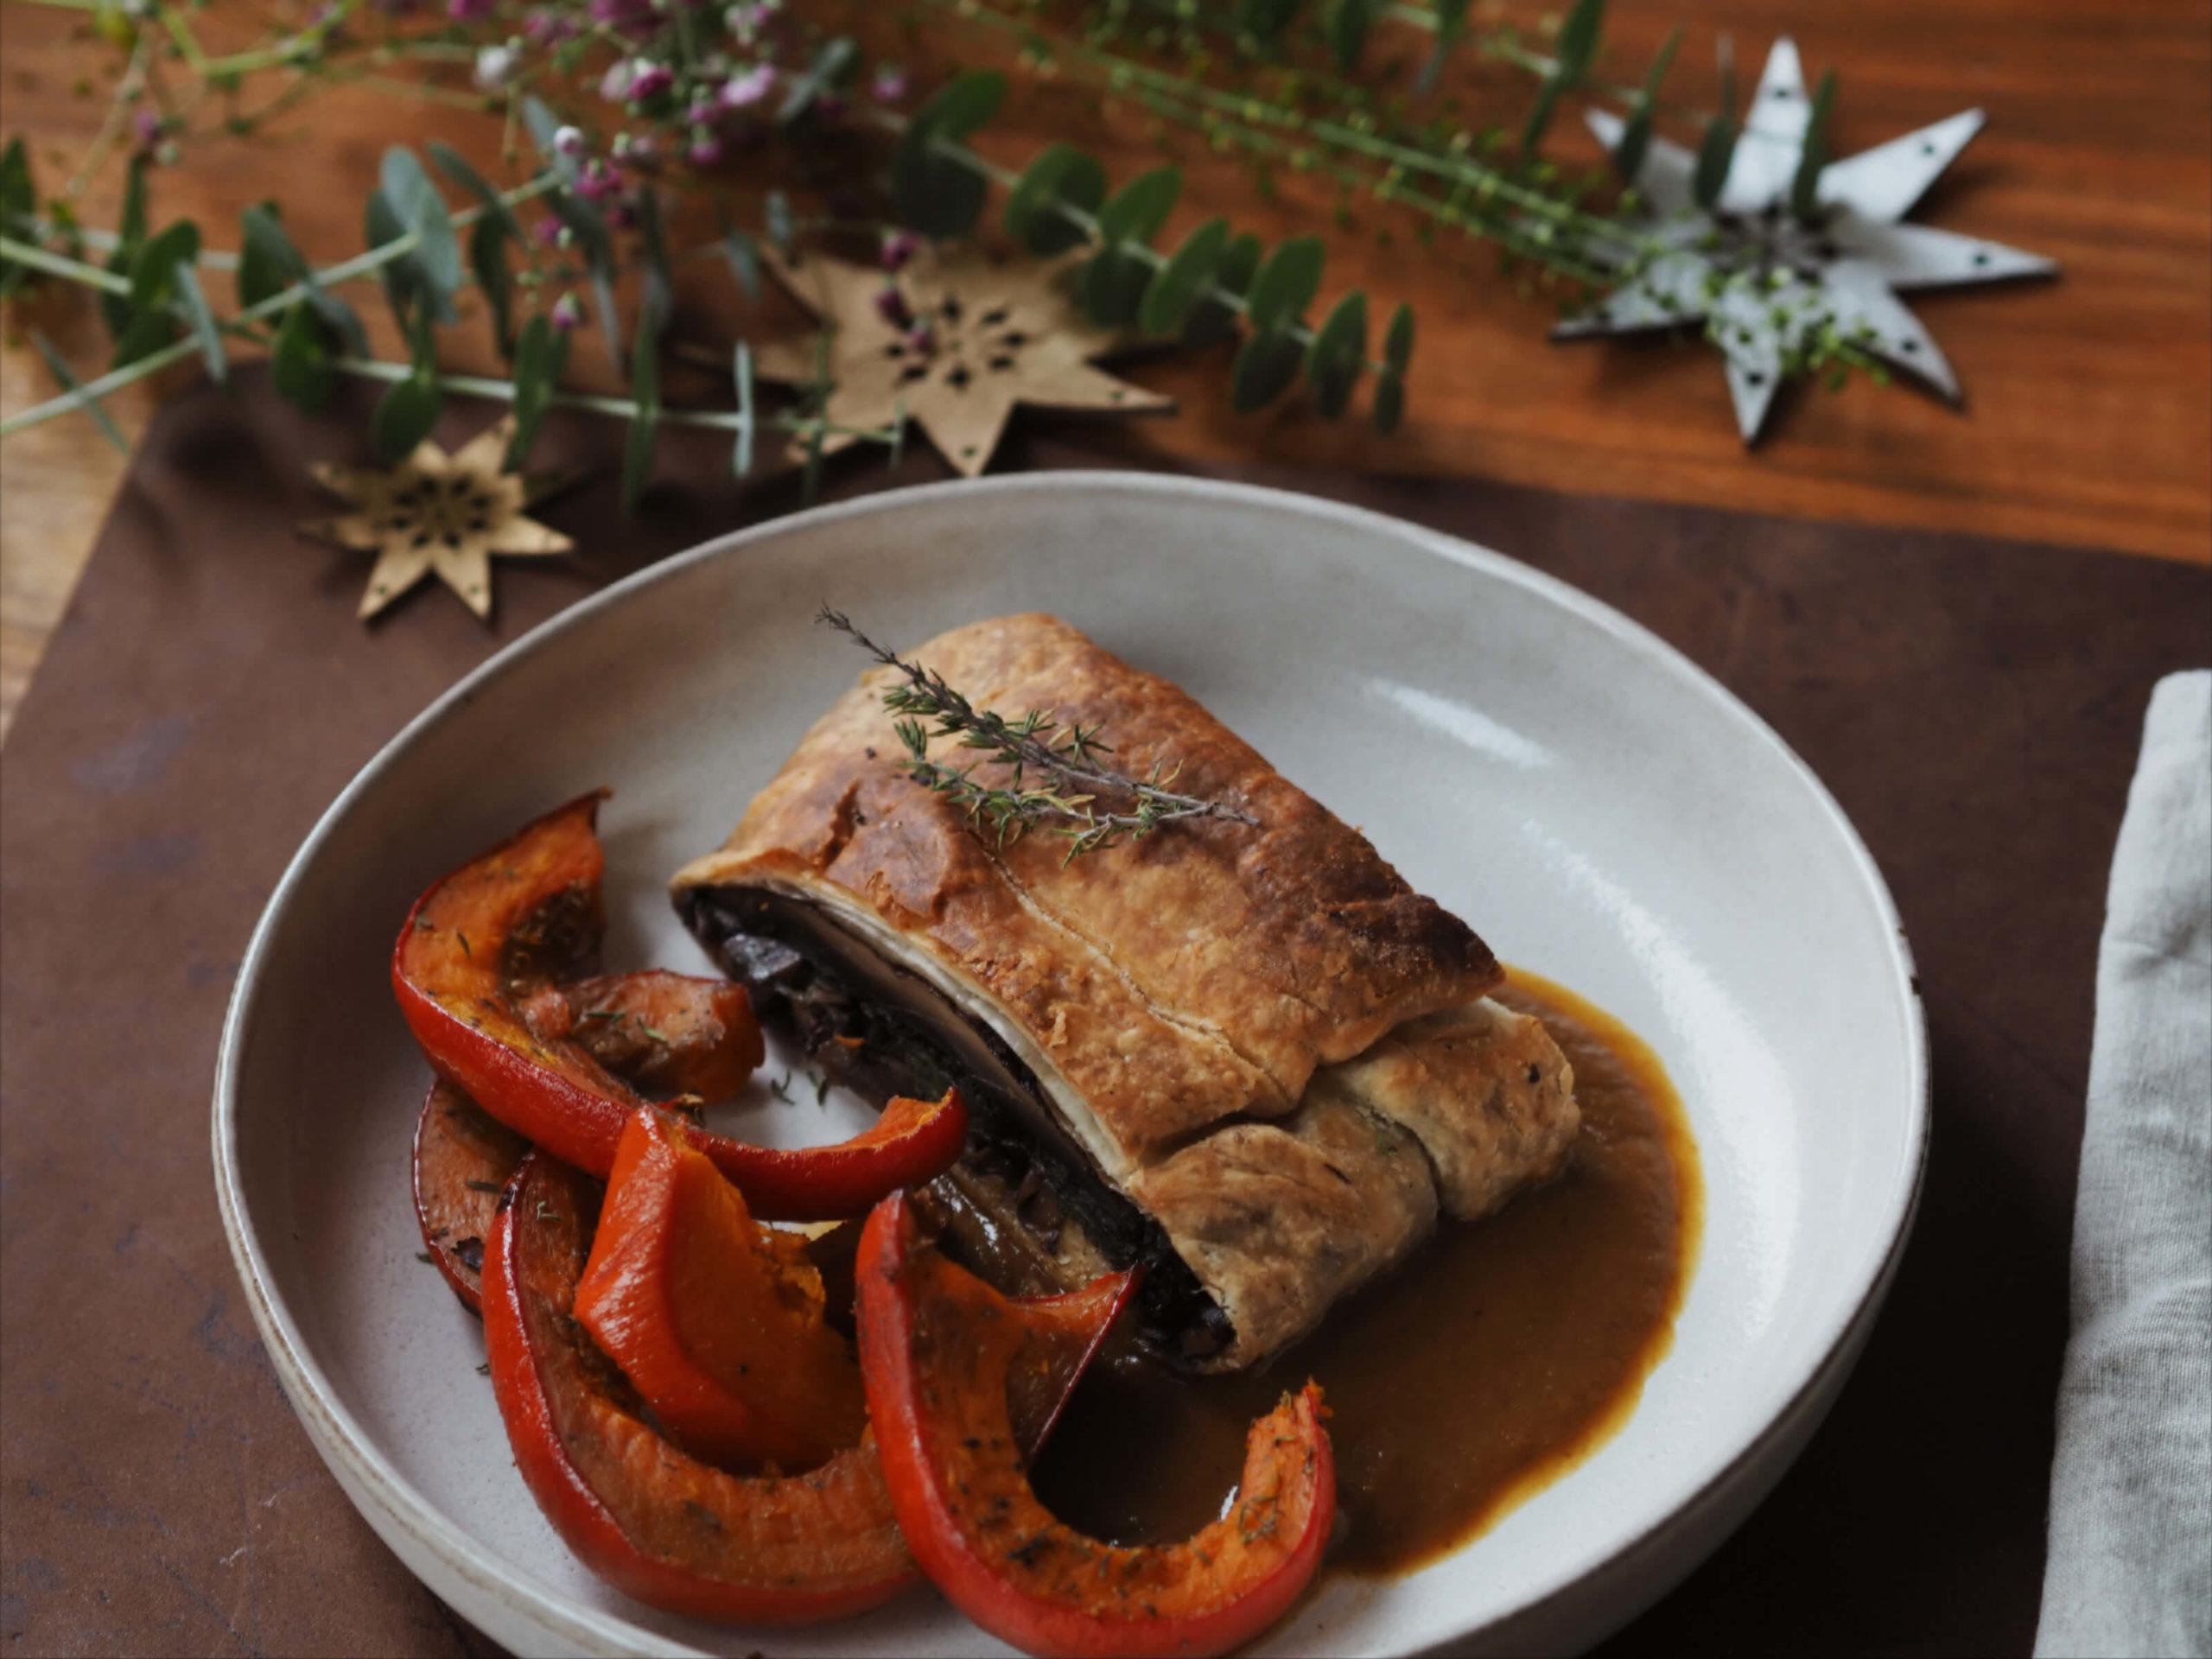 Pilz Wellington Rezept, Weihnachtsrezept, Wunschleder HOME